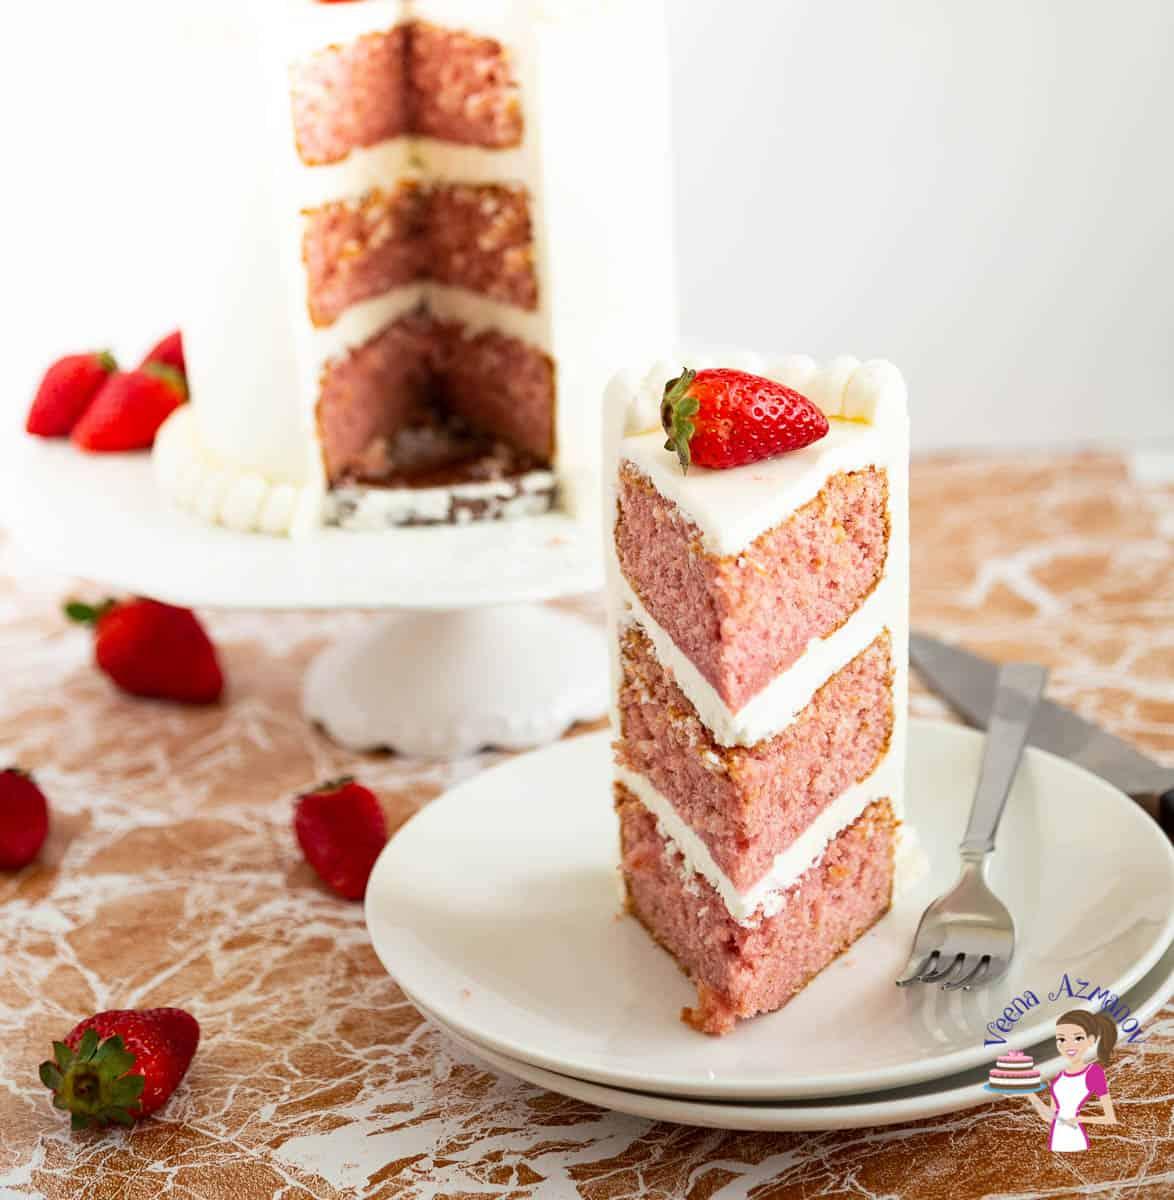 A sliced strawberry cake